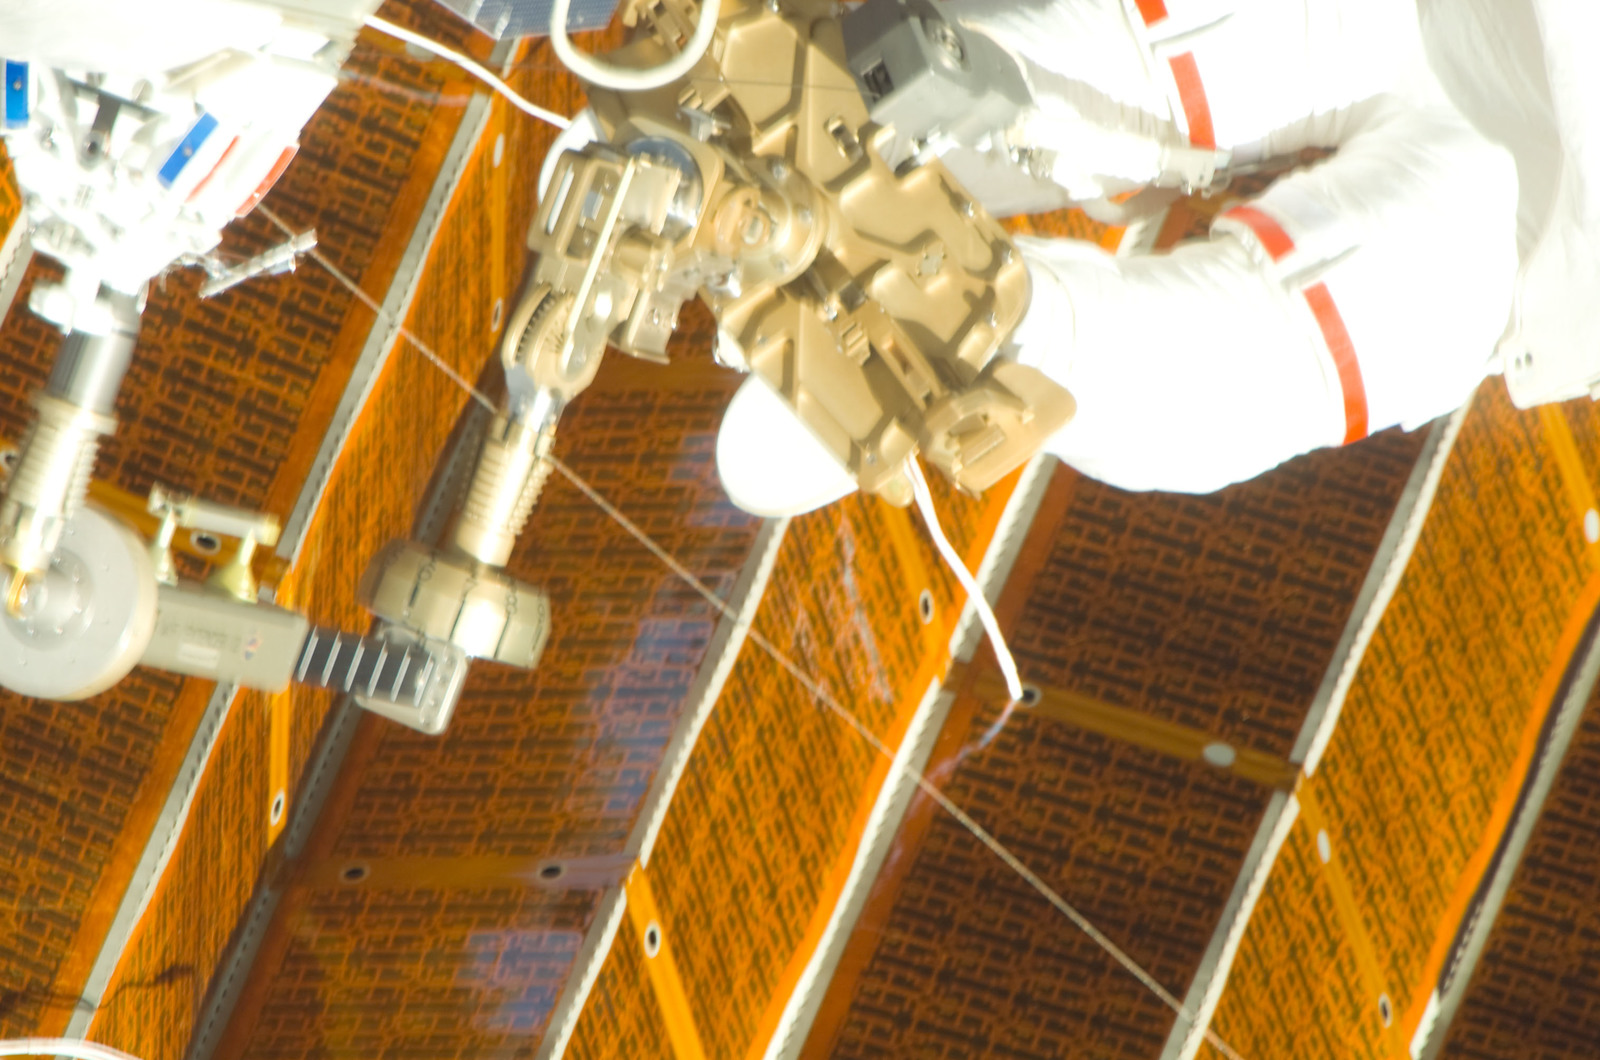 S120E008406 - STS-120 - Damaged P6 4B solar array